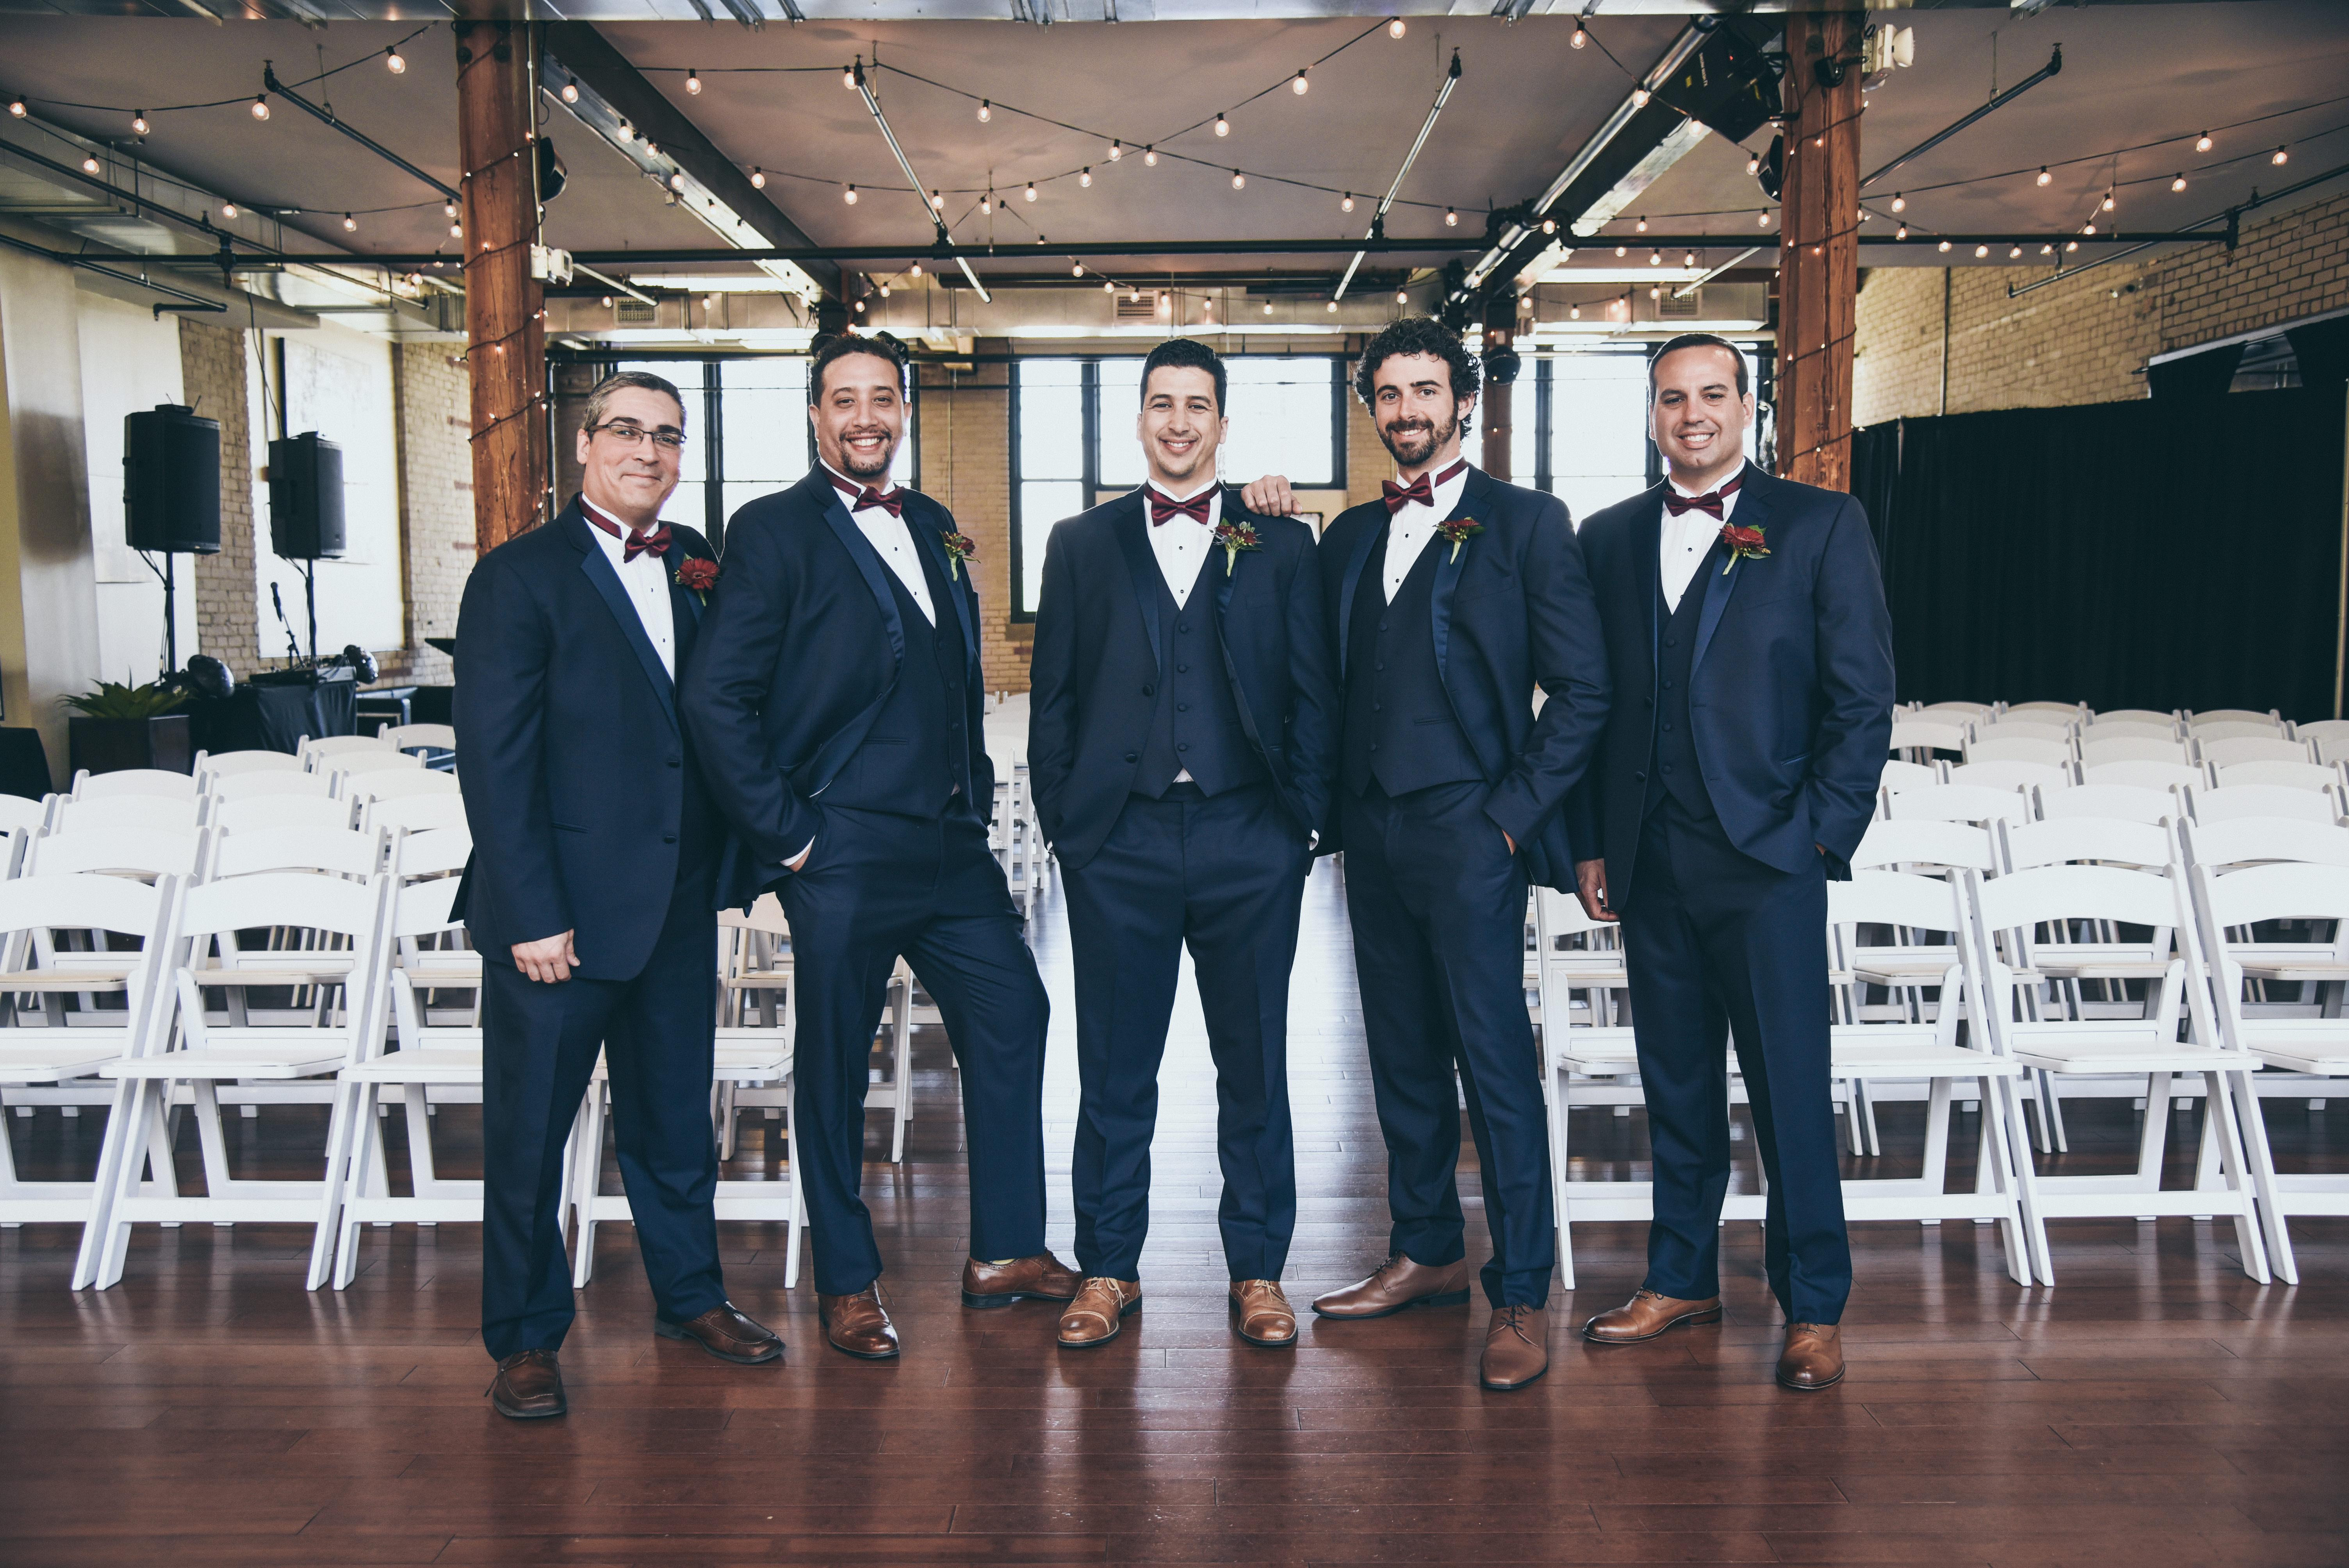 groom and groomsmen in navy tuxedos in a loft venue under bistro lights